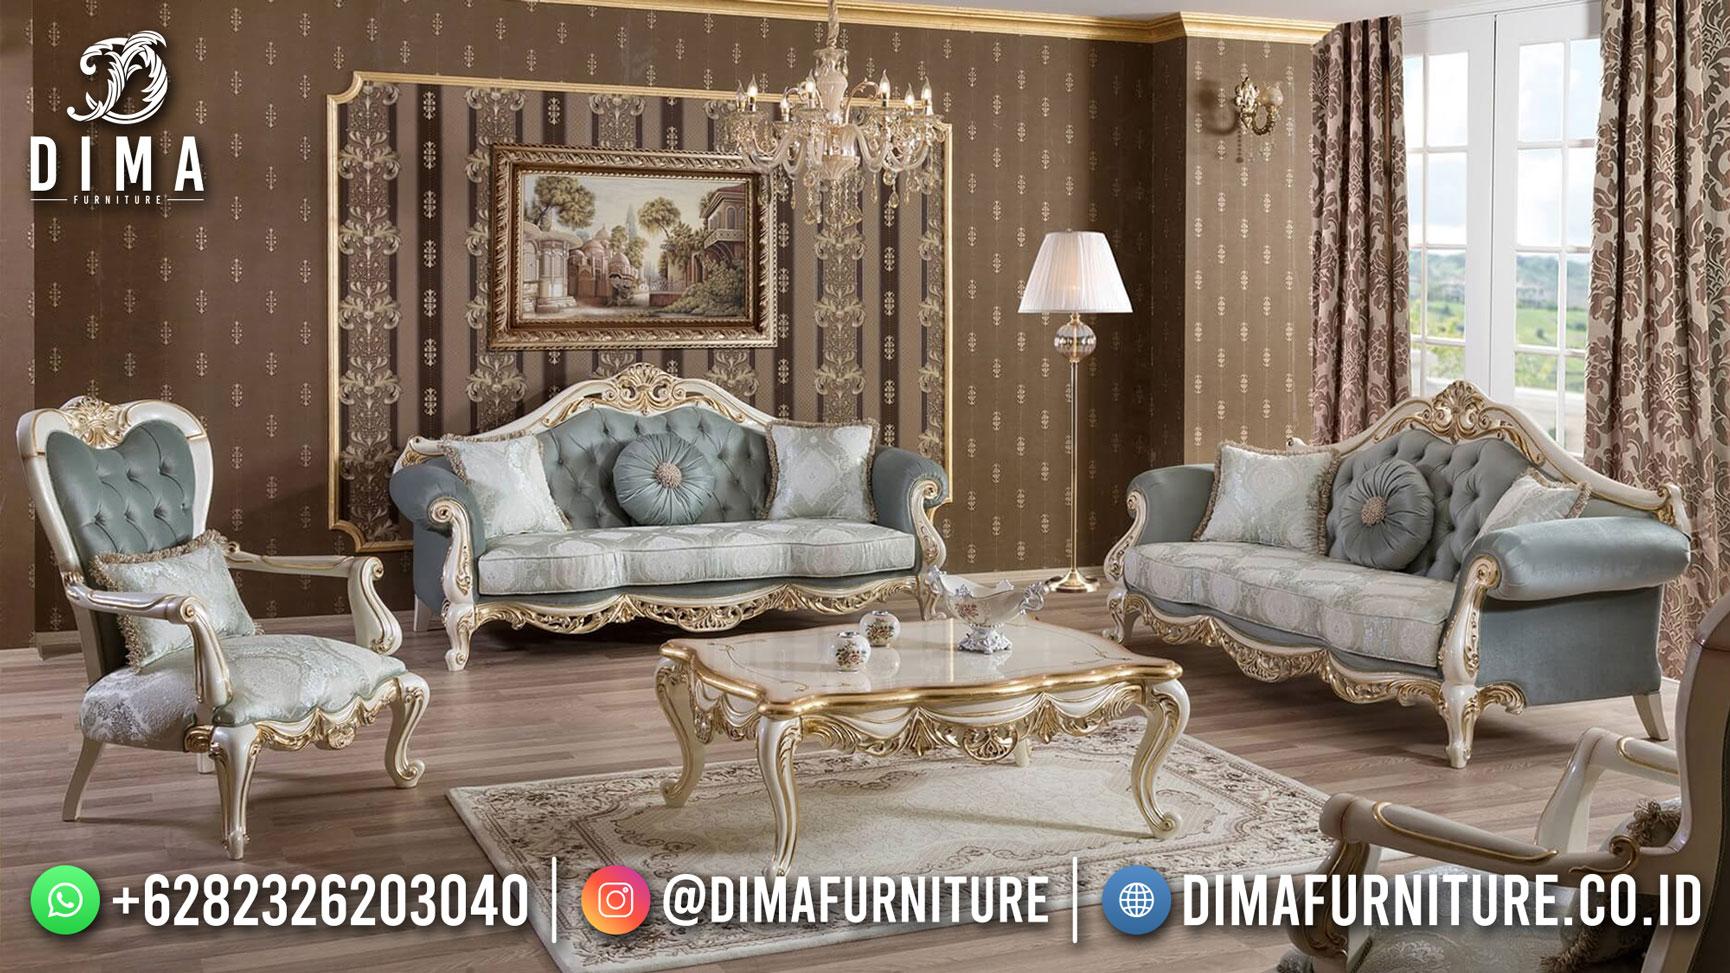 Best 2021 Set Sofa Tamu Mewah Ukiran Jepara Full Ivory Gold DF-1537